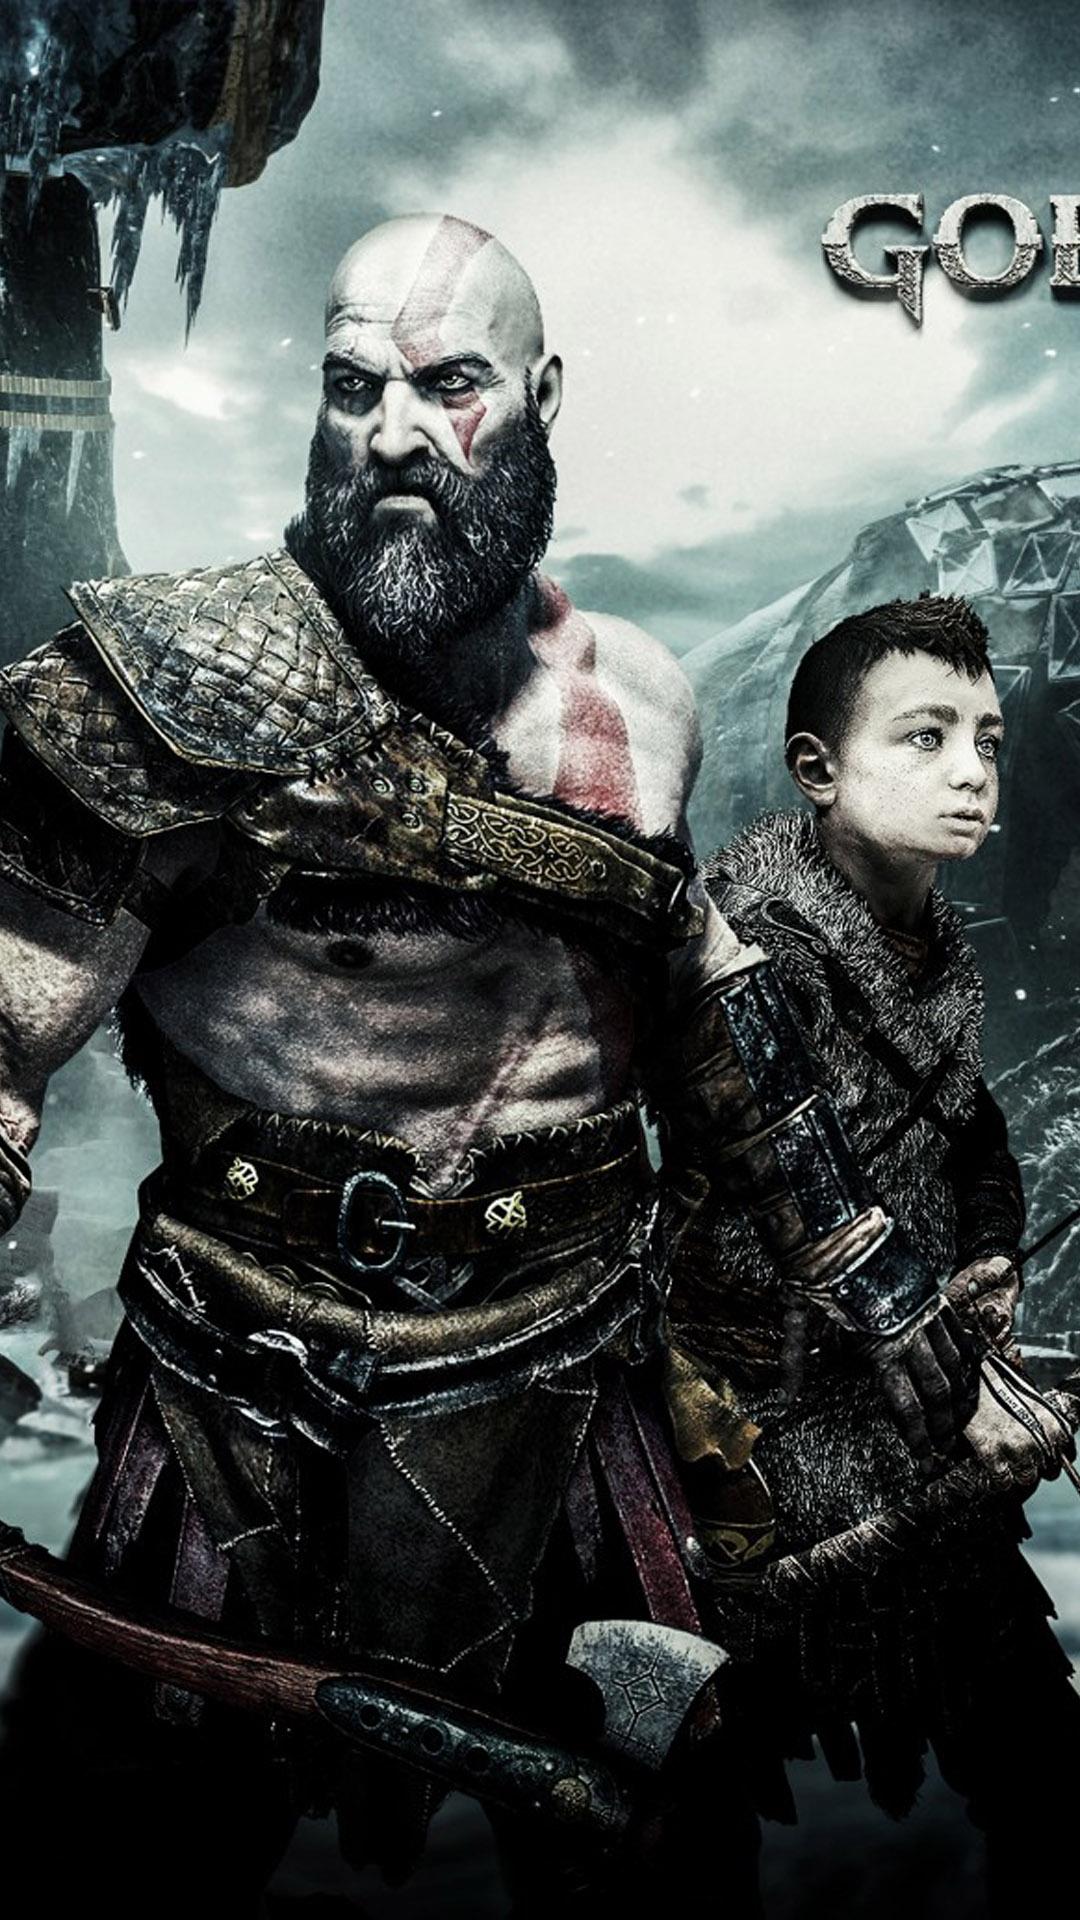 Kratos Atreus Together In God Of War Free 4k Ultra Hd